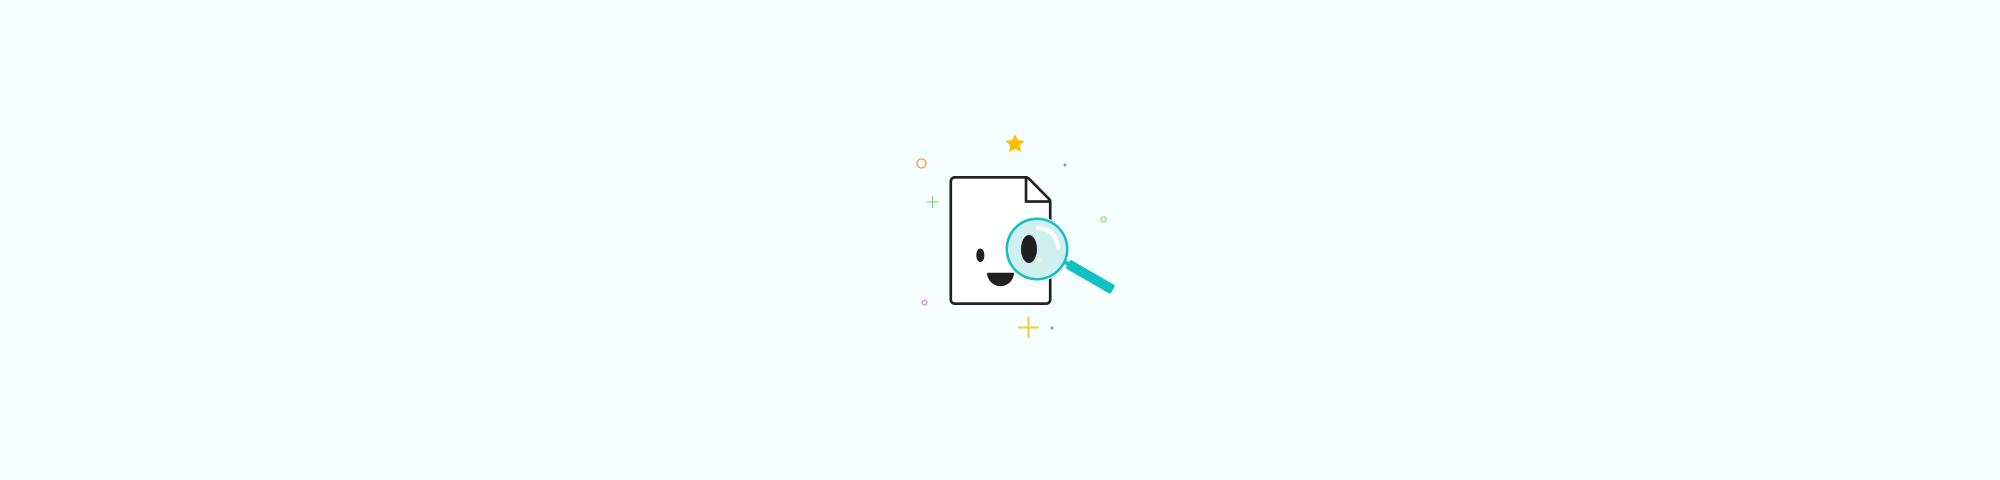 how-to-make-a-document-a-pdf